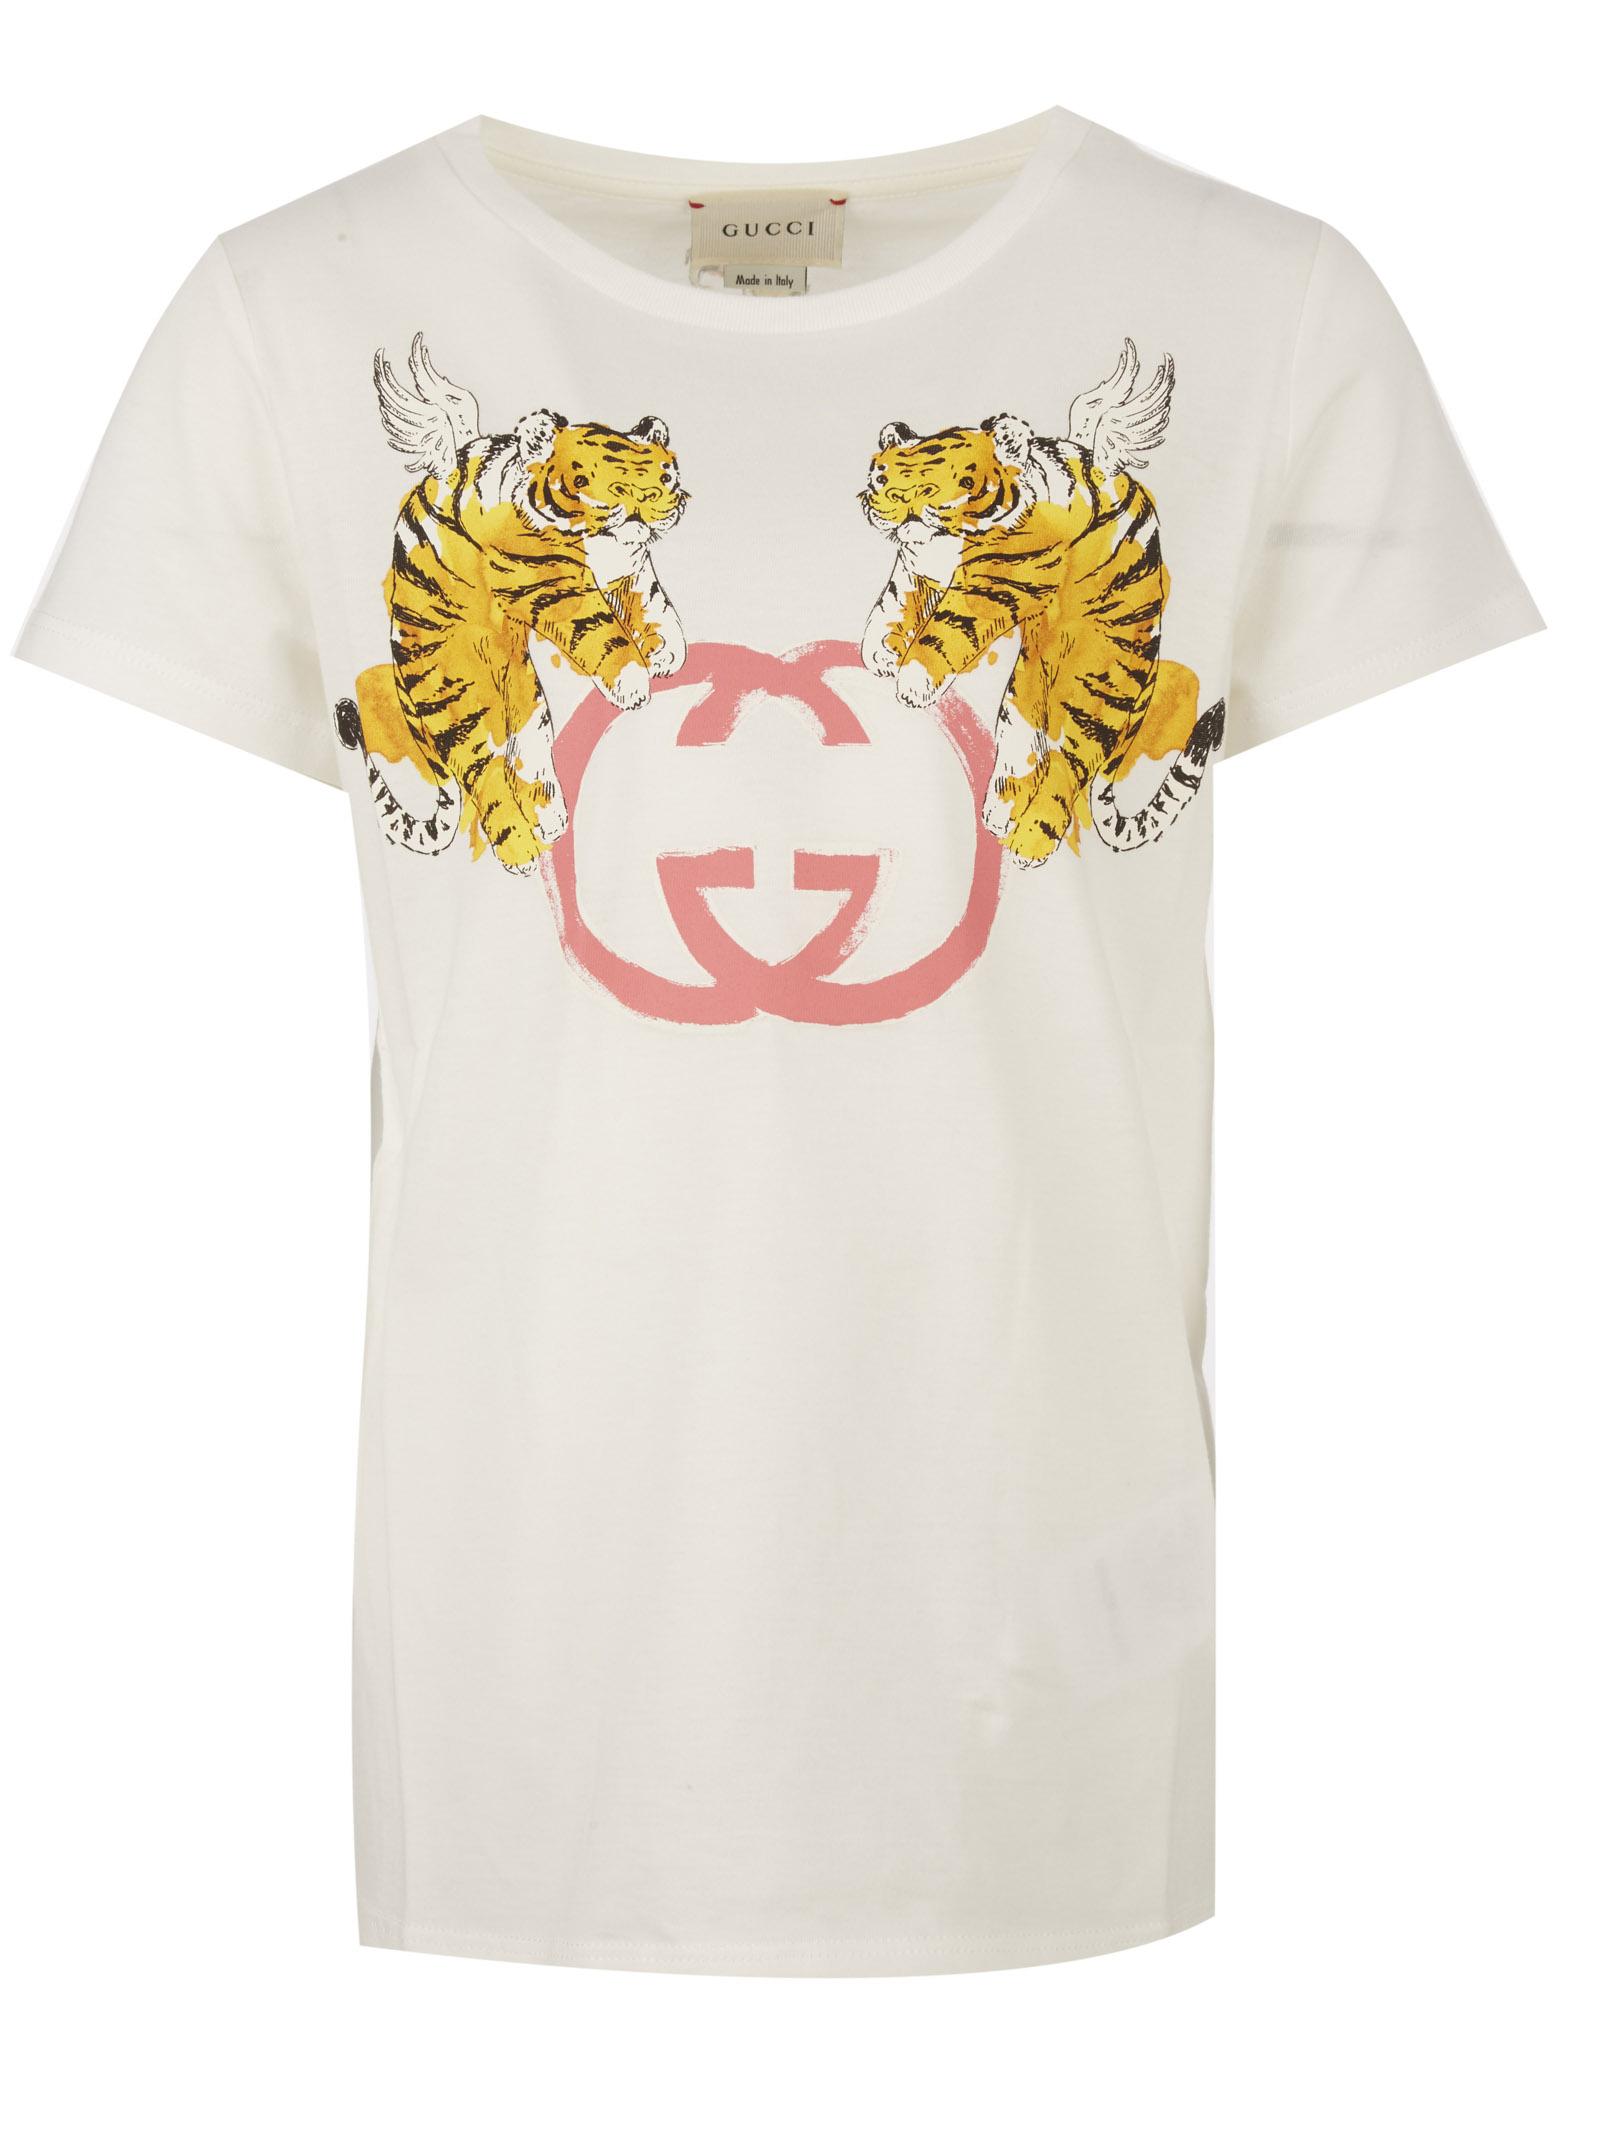 f10784d3b8 Michele Franzese Moda. 0. Gucci Junior t-shirt Gucci Junior | 8 |  554879XJAOX9541